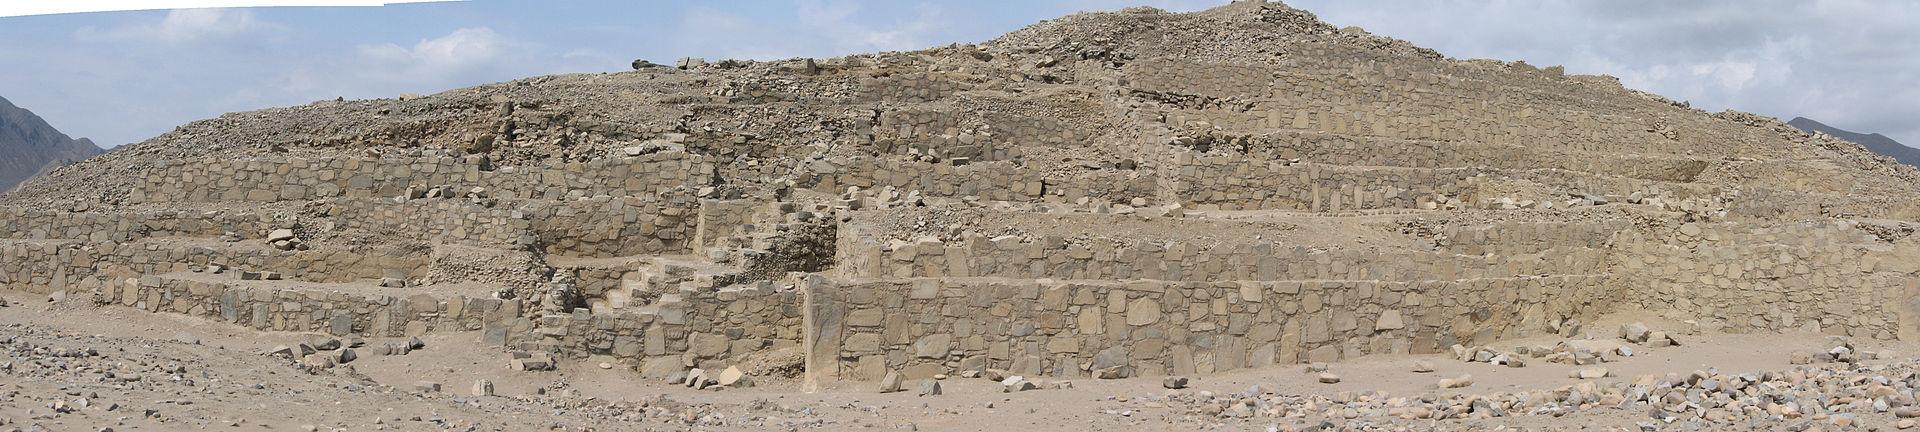 Piramide_de_Caral.jpg